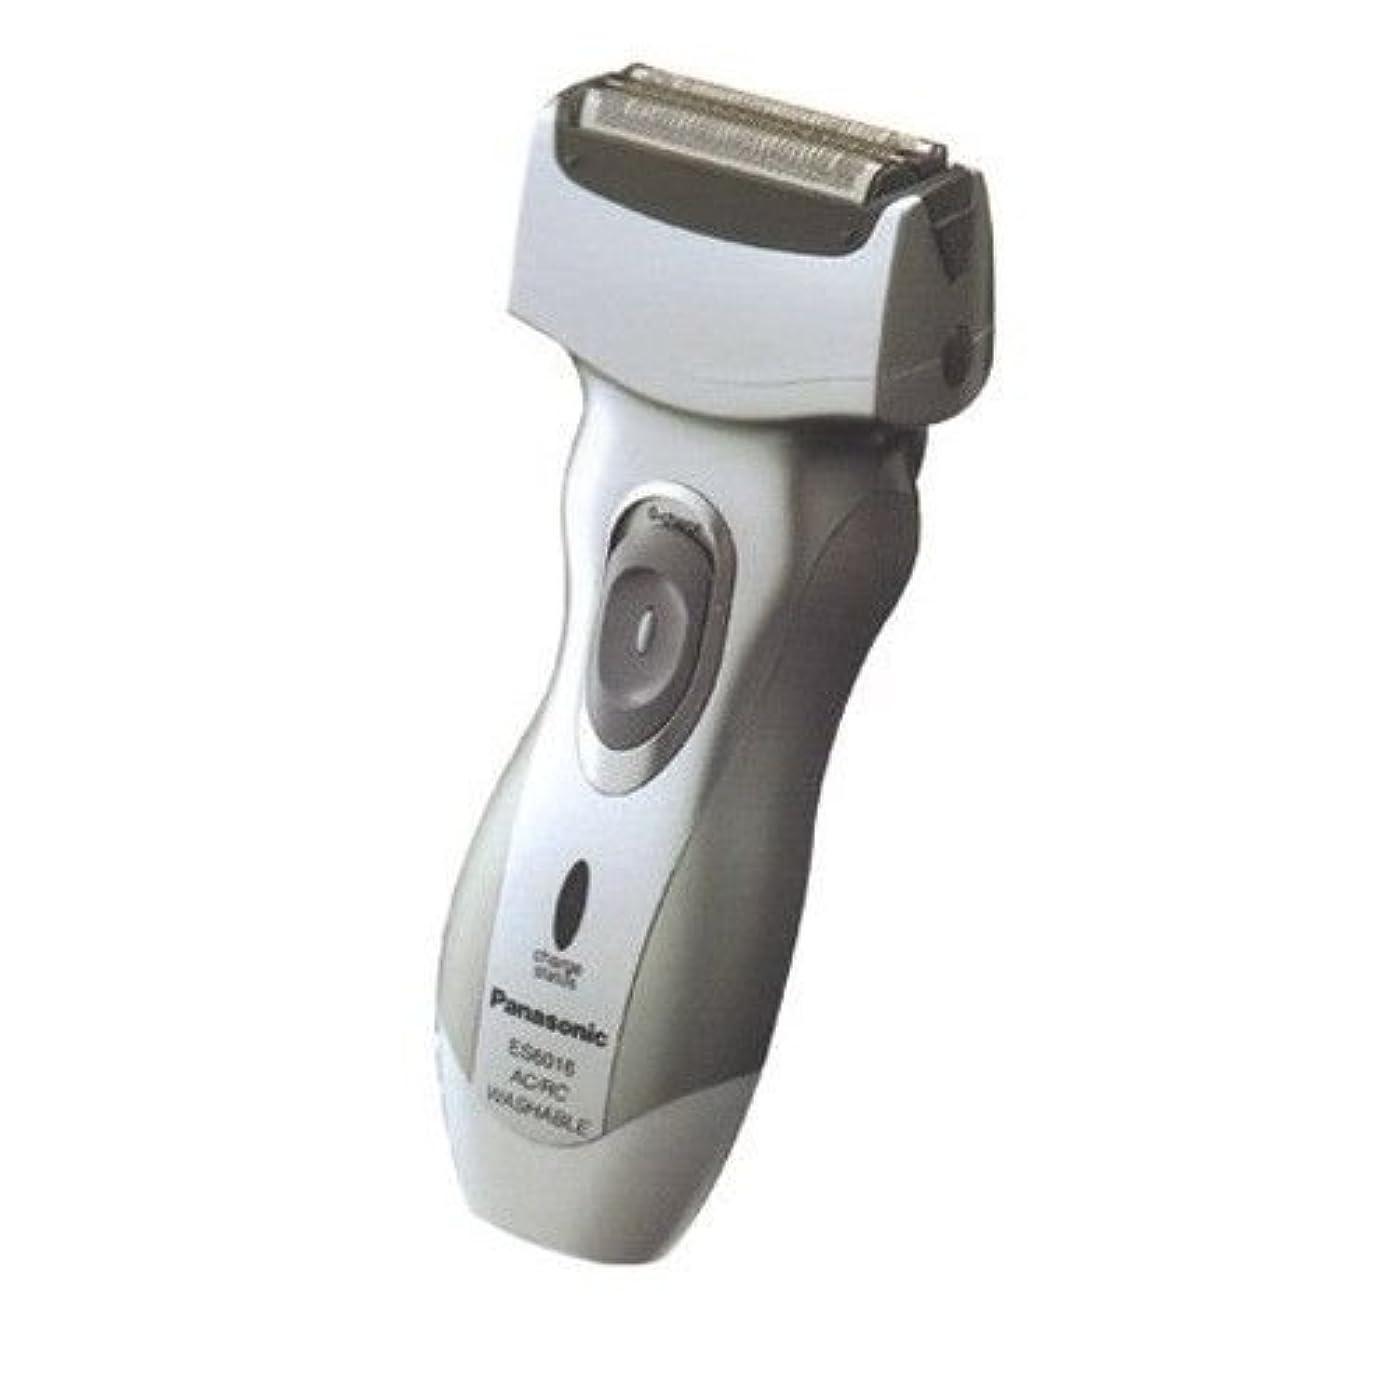 Panasonic ES6016 電気シェーバーかみそり男性トリマークリッパー ES-6016 と [並行輸入品]